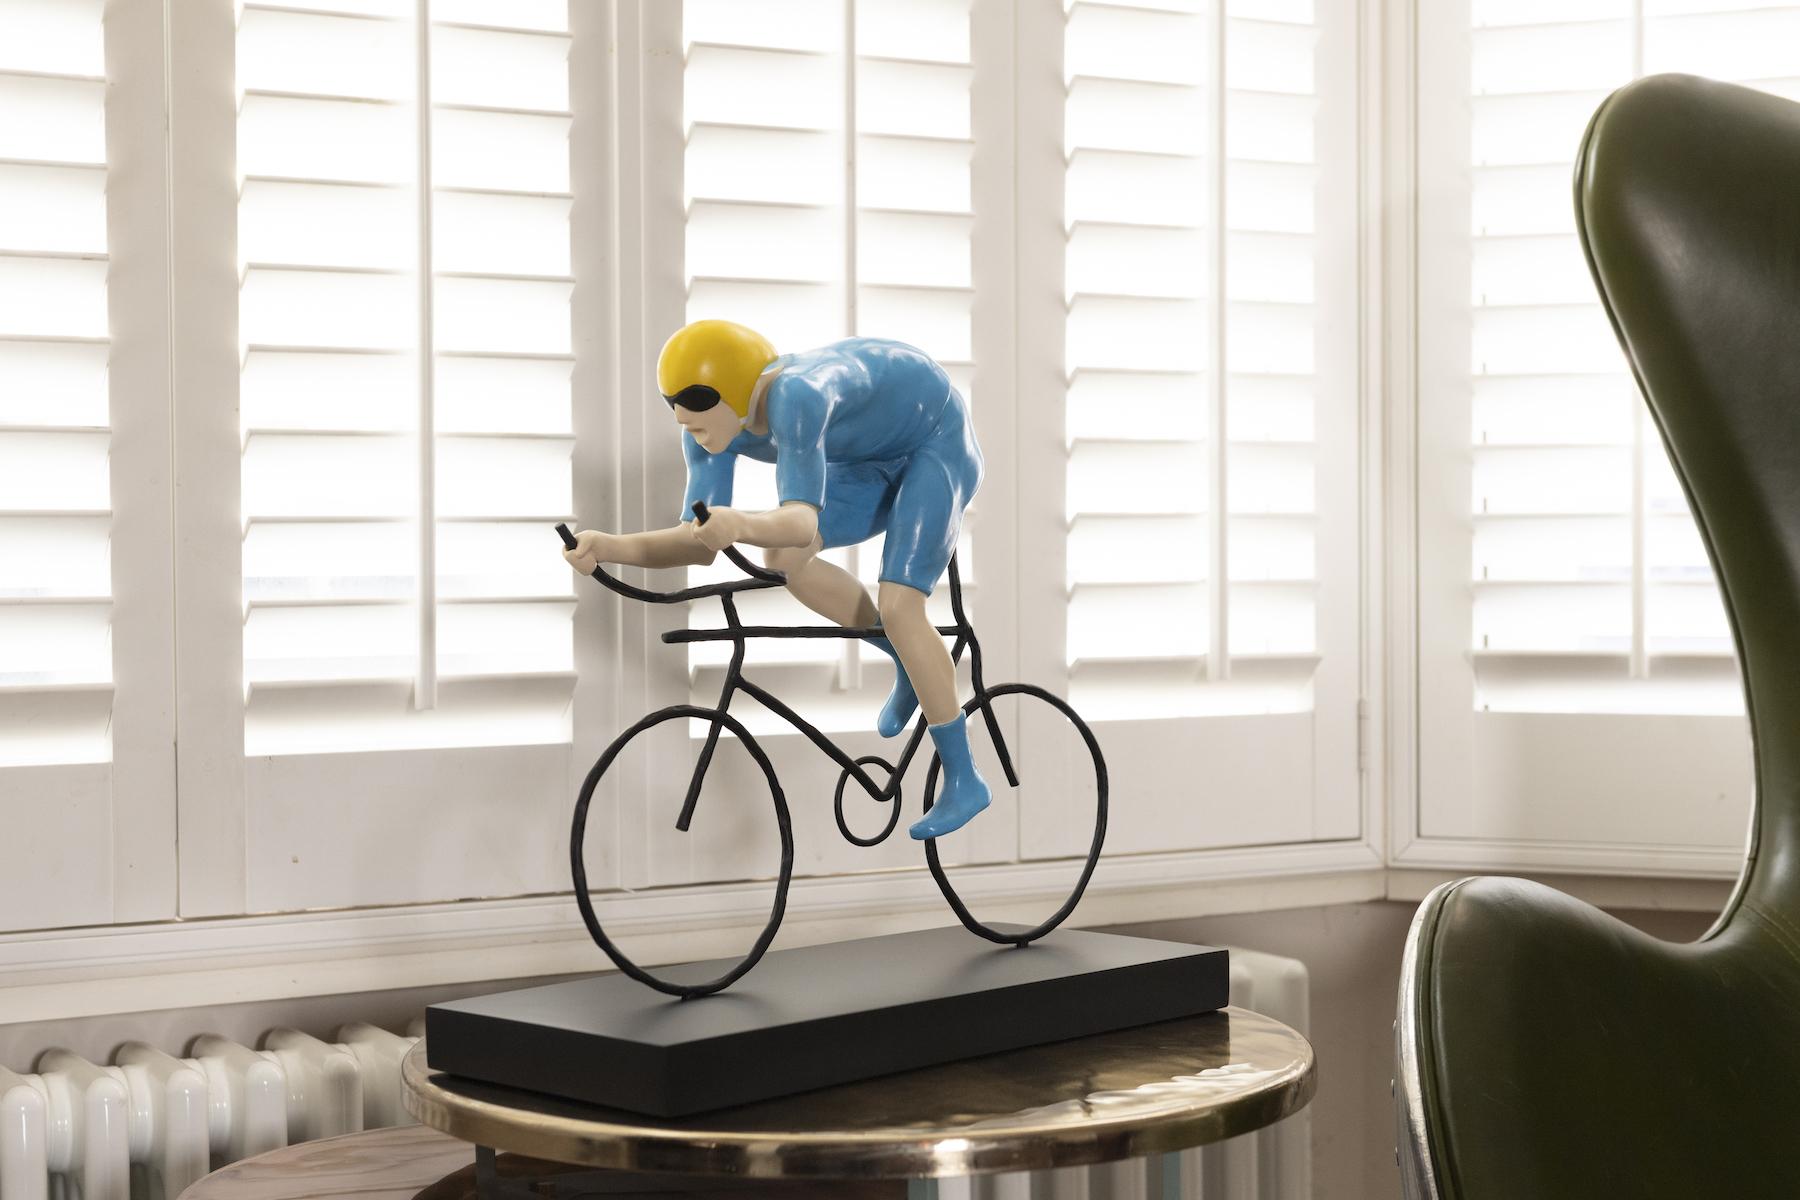 Mackenzie Thorpe The Fastest sculpture